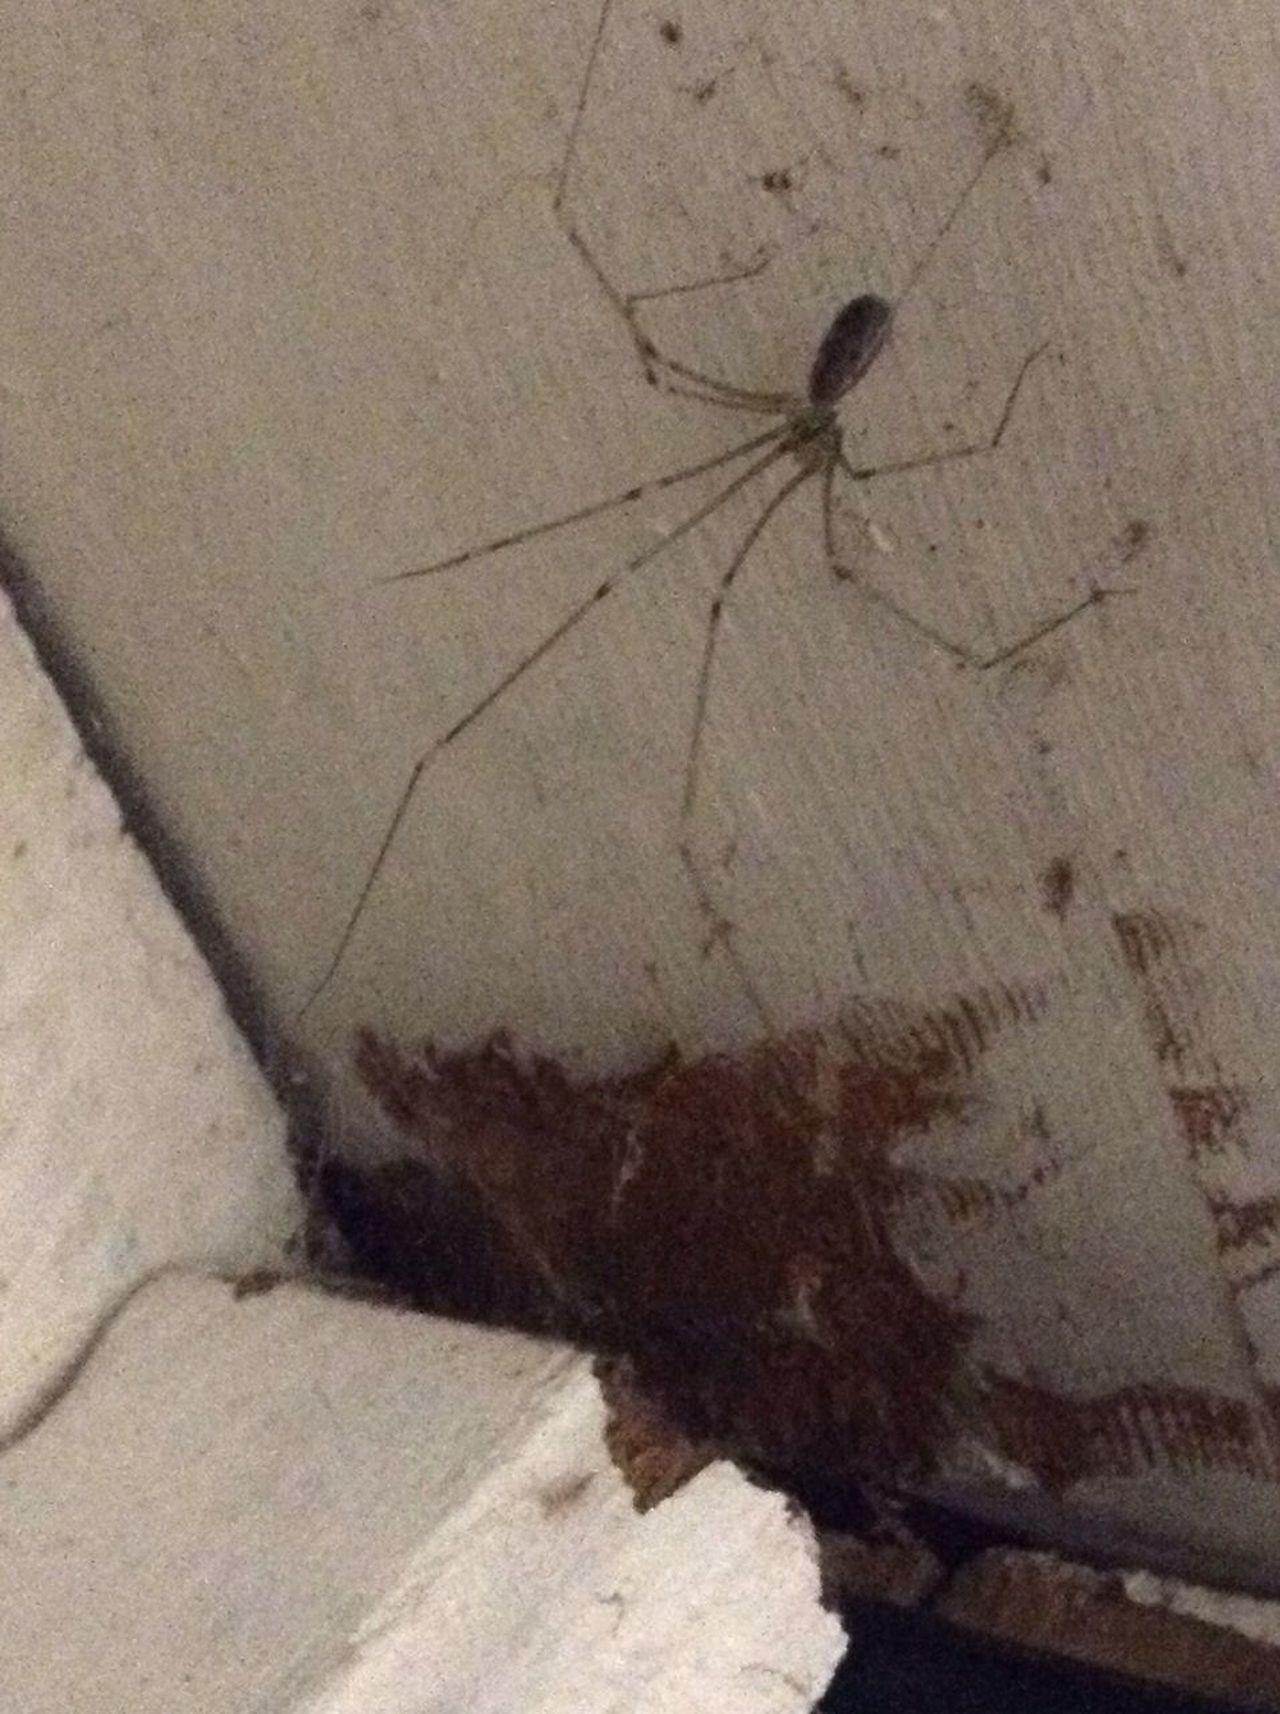 Spider Spiders Cellar Spider Creepy